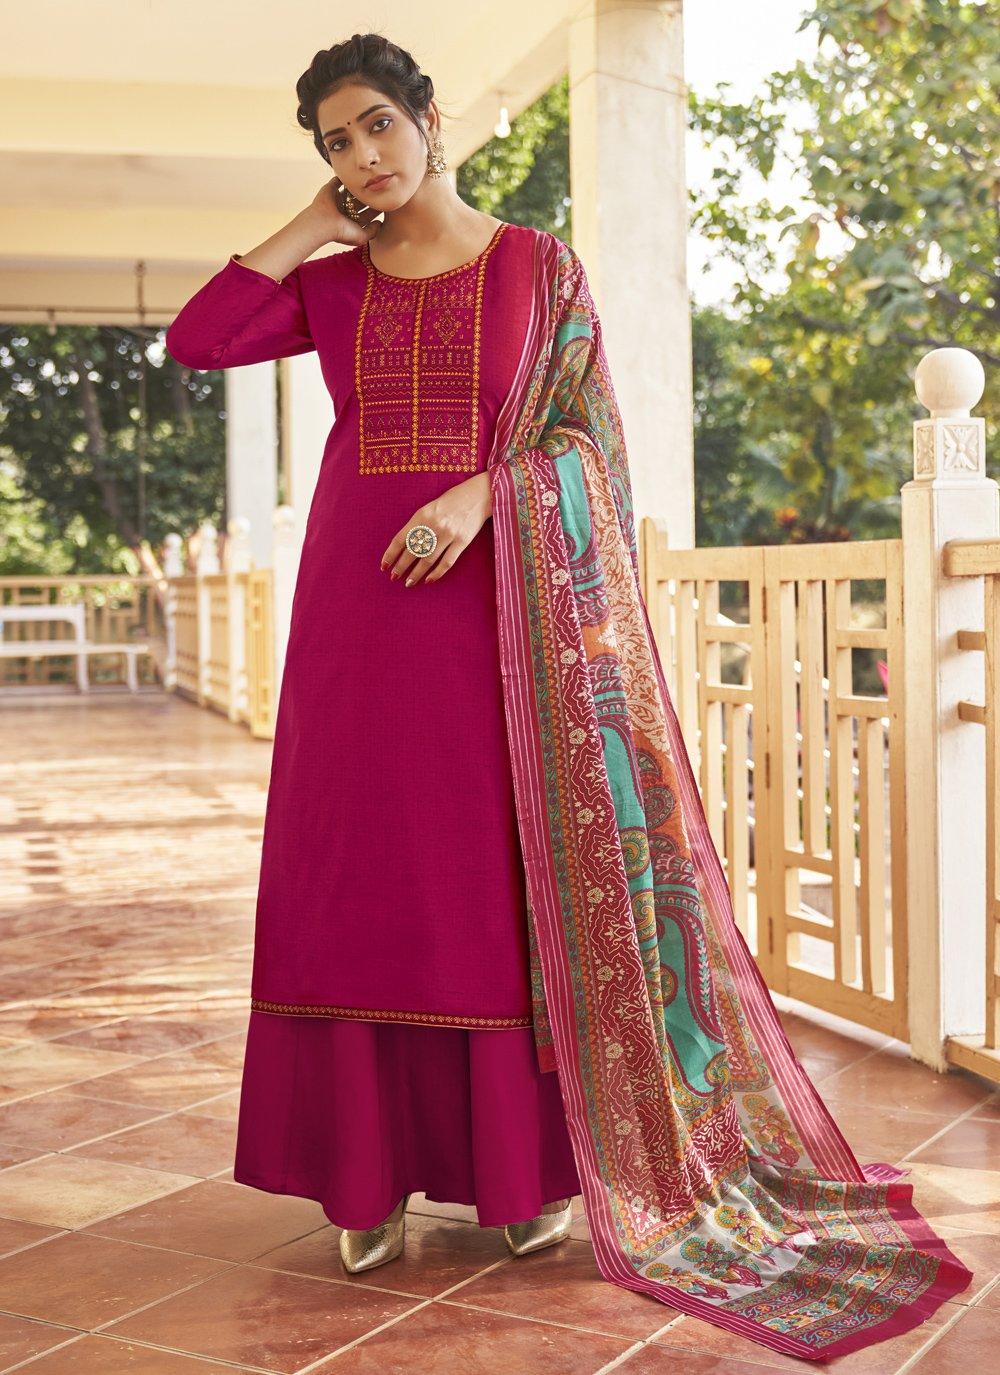 Embroidered Cotton Magenta Designer Pakistani Salwar Suit